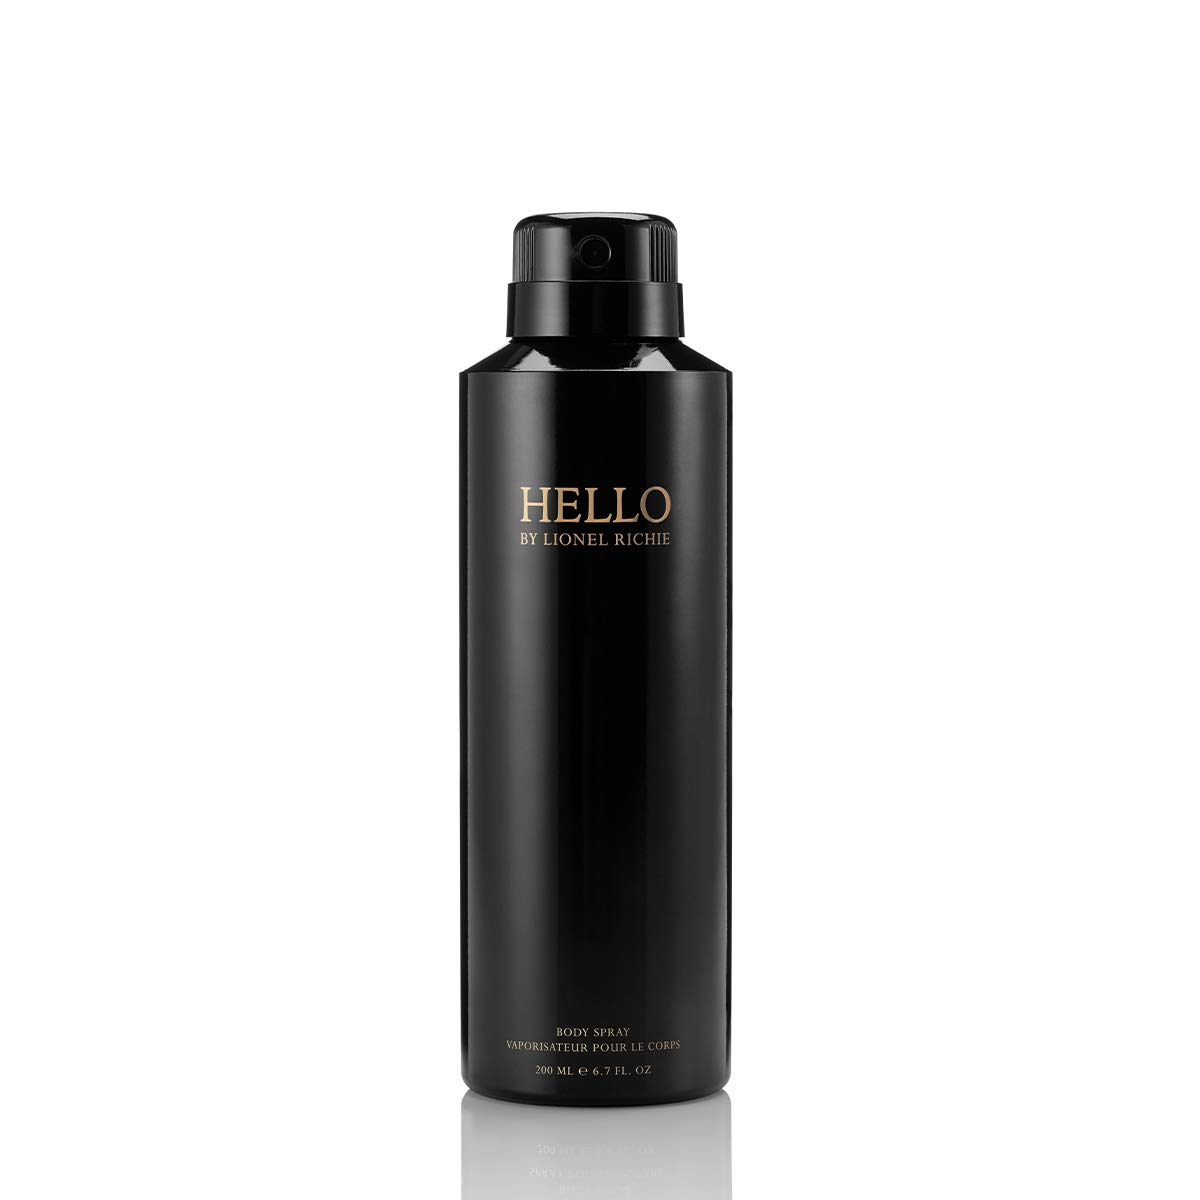 HELLO by Lionel Richie Body Spray   Spray Fragrance for Men   Notes of Grapefruit, Lavender, Violet Leaves, Vetiver   6.7 oz/200 mL